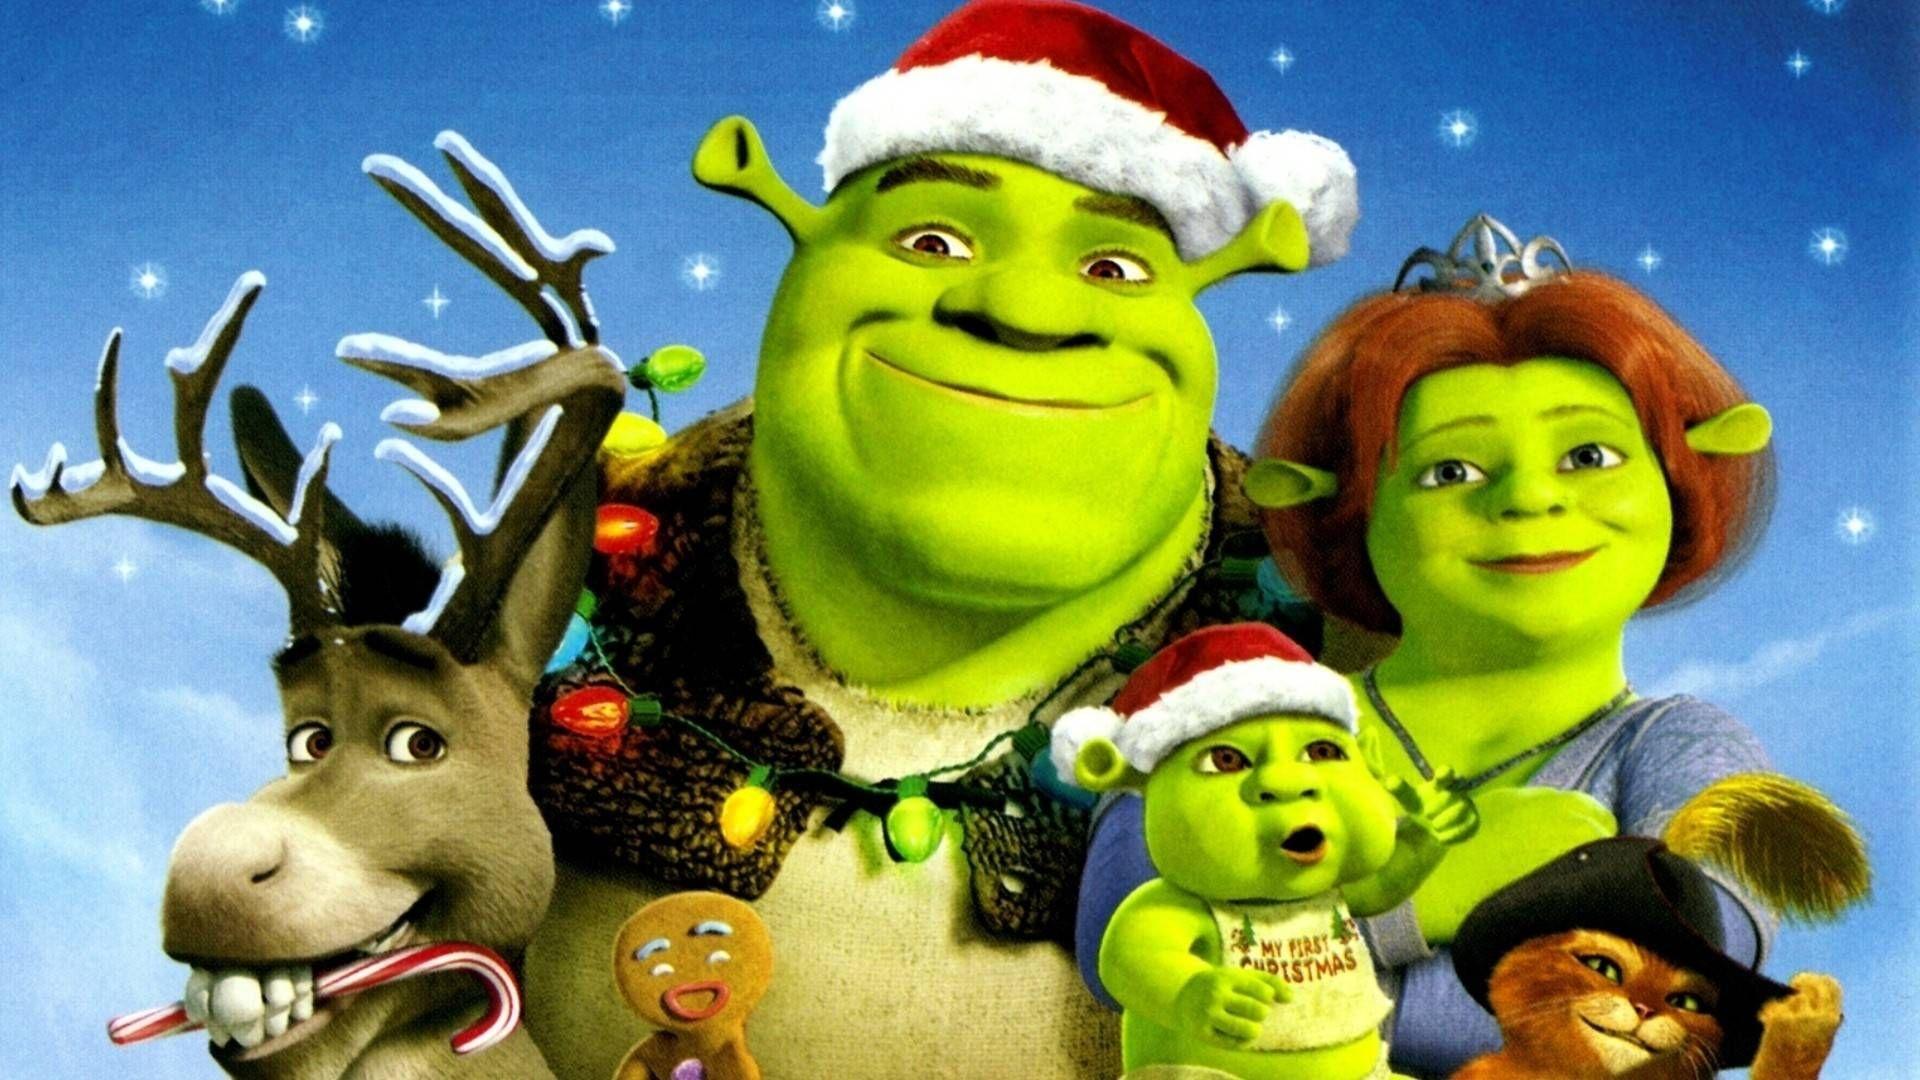 Shrek Christmas.Shrek The Third Wallpapers Seecartoon Com Shrek